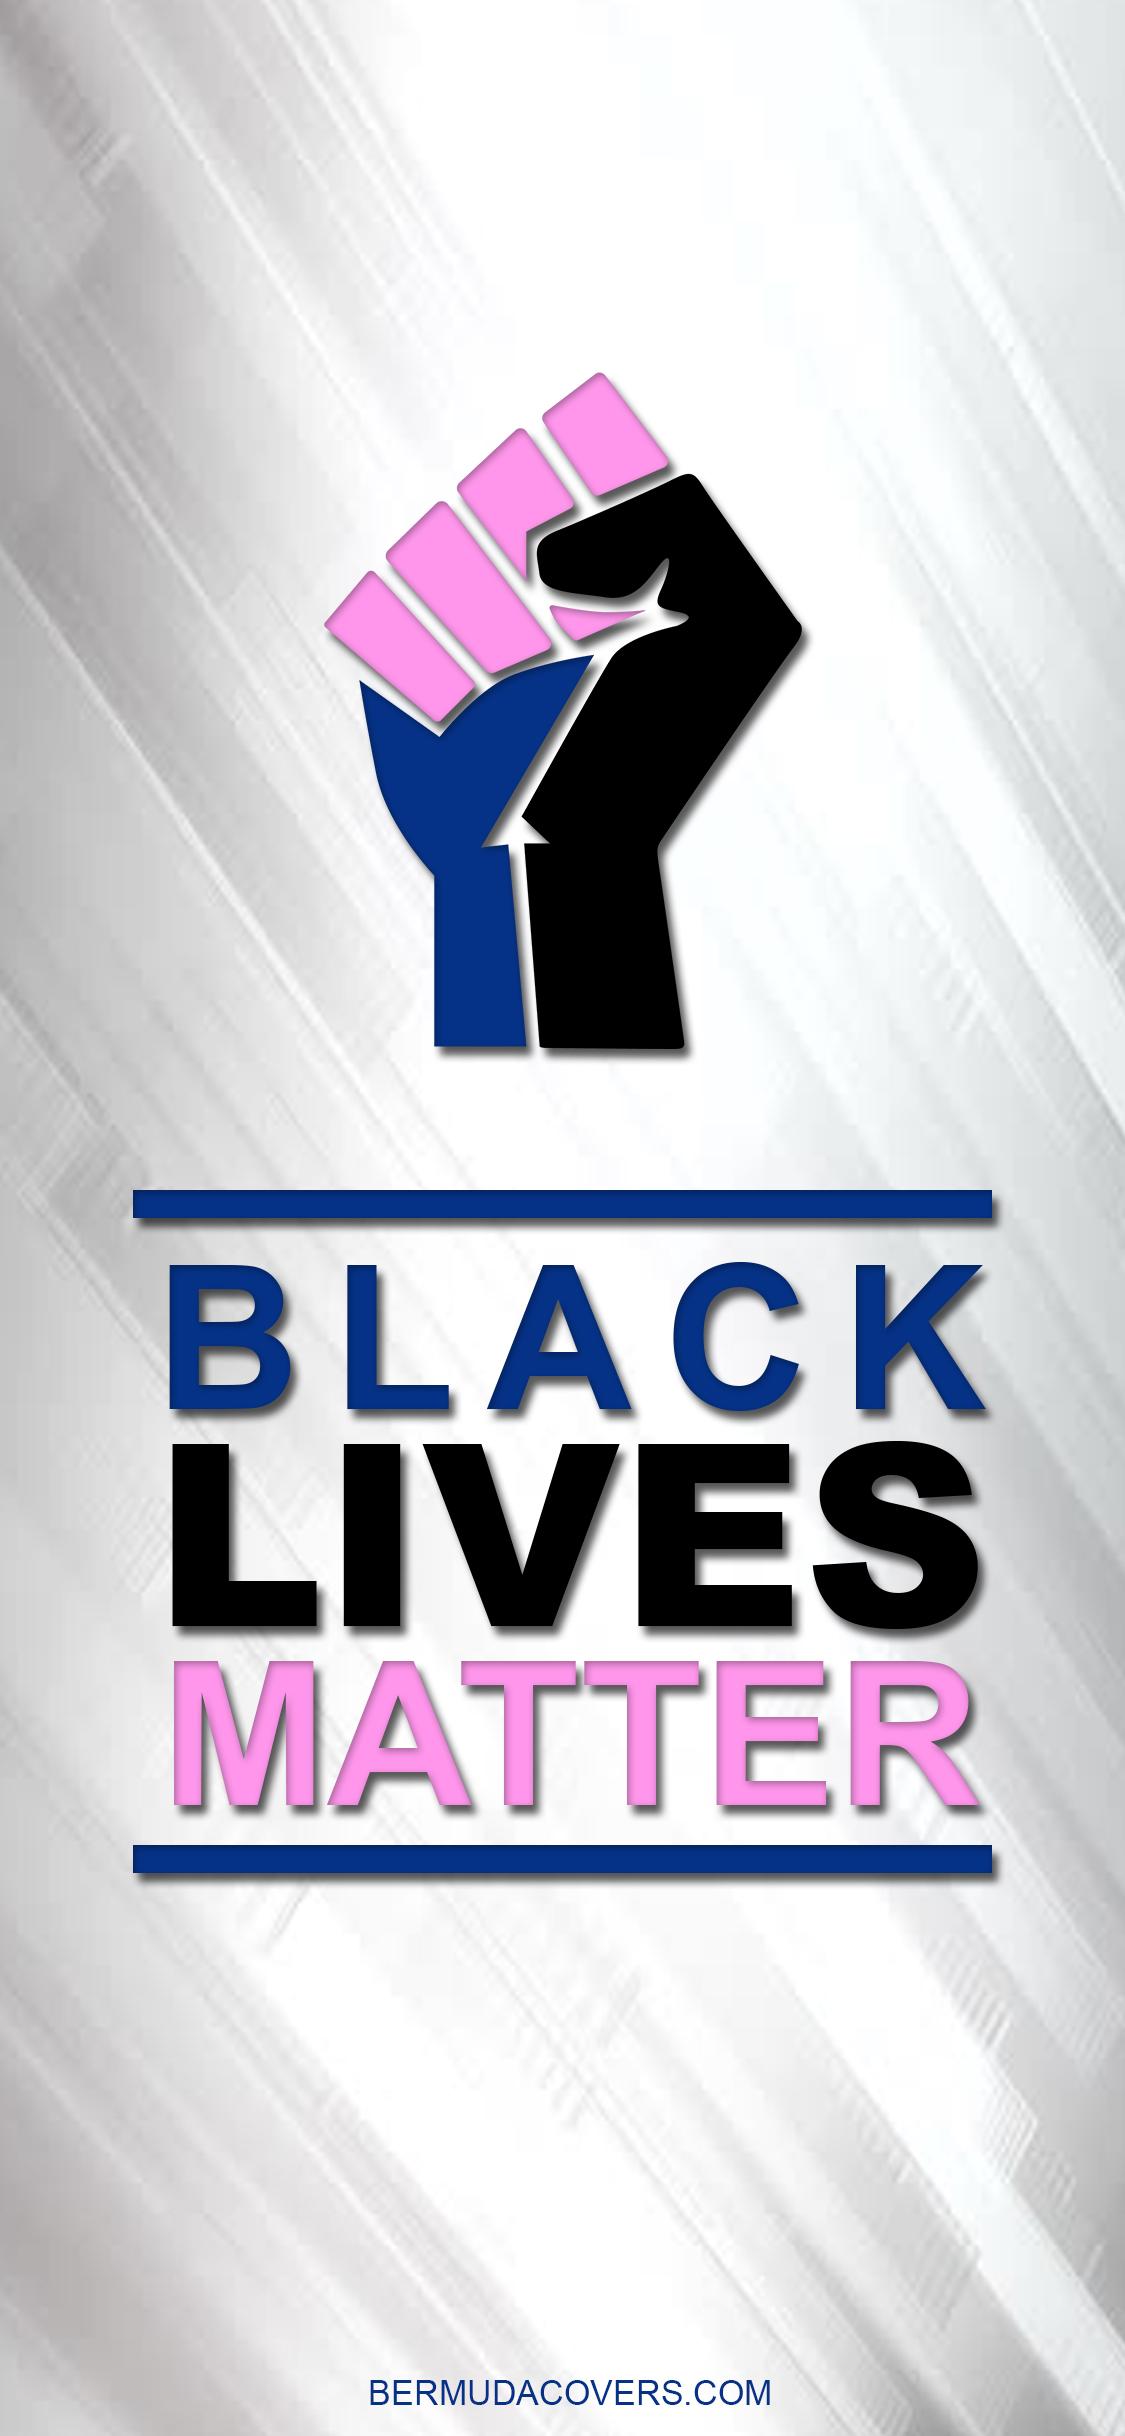 Black Lives Matter Bernews Mobile phone wallpaper lock screen design image photo 7PNZqvq4